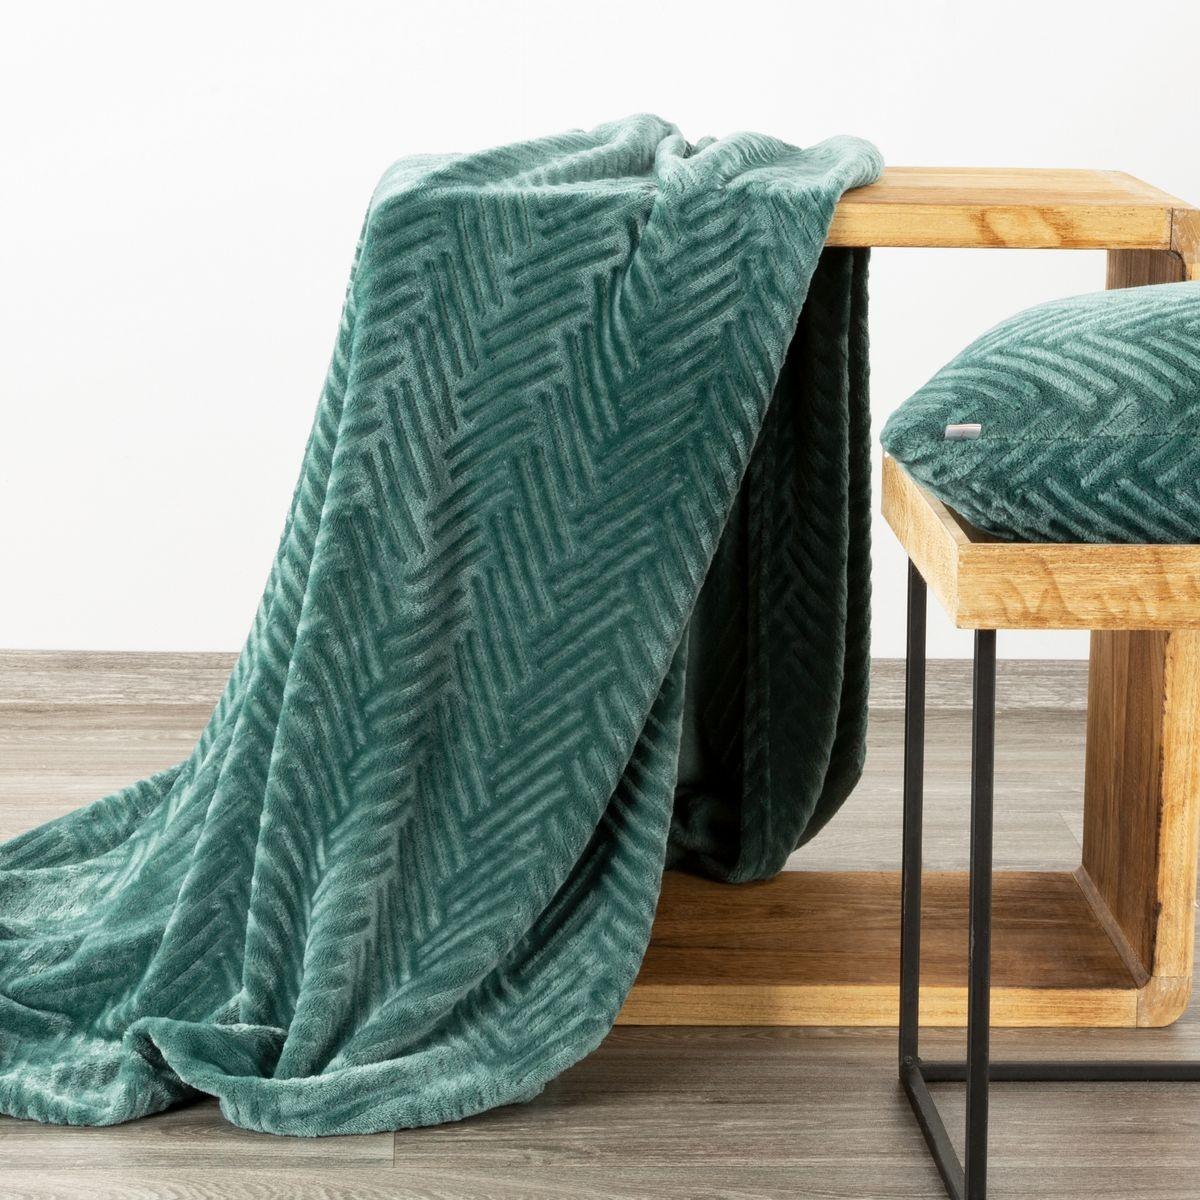 DomTextilu Moderná zelená deka s decentným reliéfnym vzorom 150 x 200 cm Šírka: 150 cm   Dĺžka: 200 cm 42793-207721 Zelená